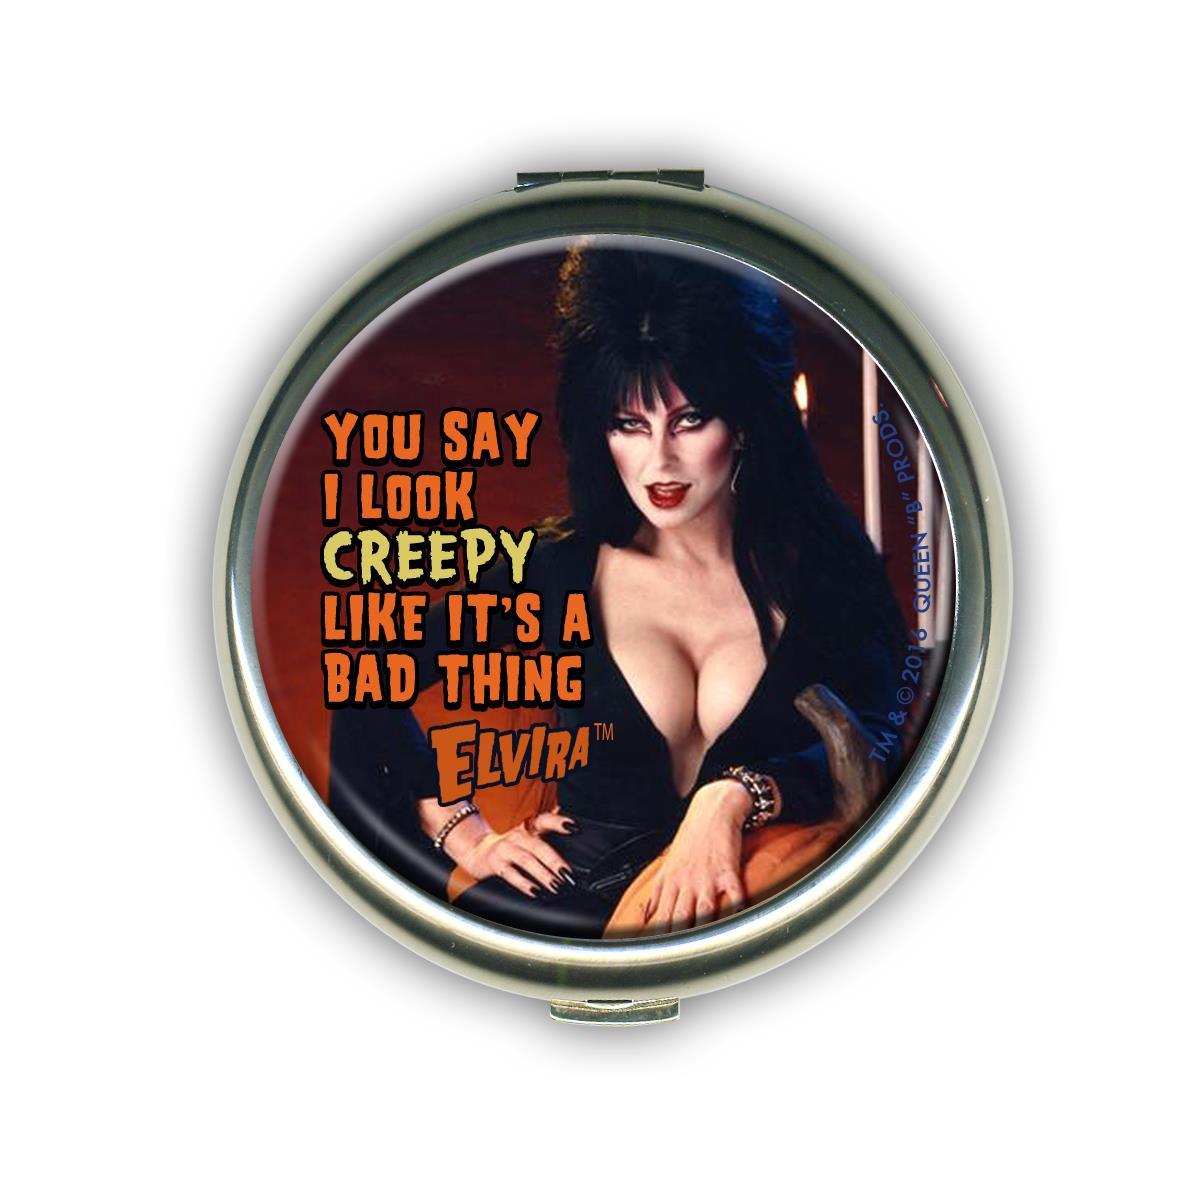 Elvira Creepy Compact Mirror* -